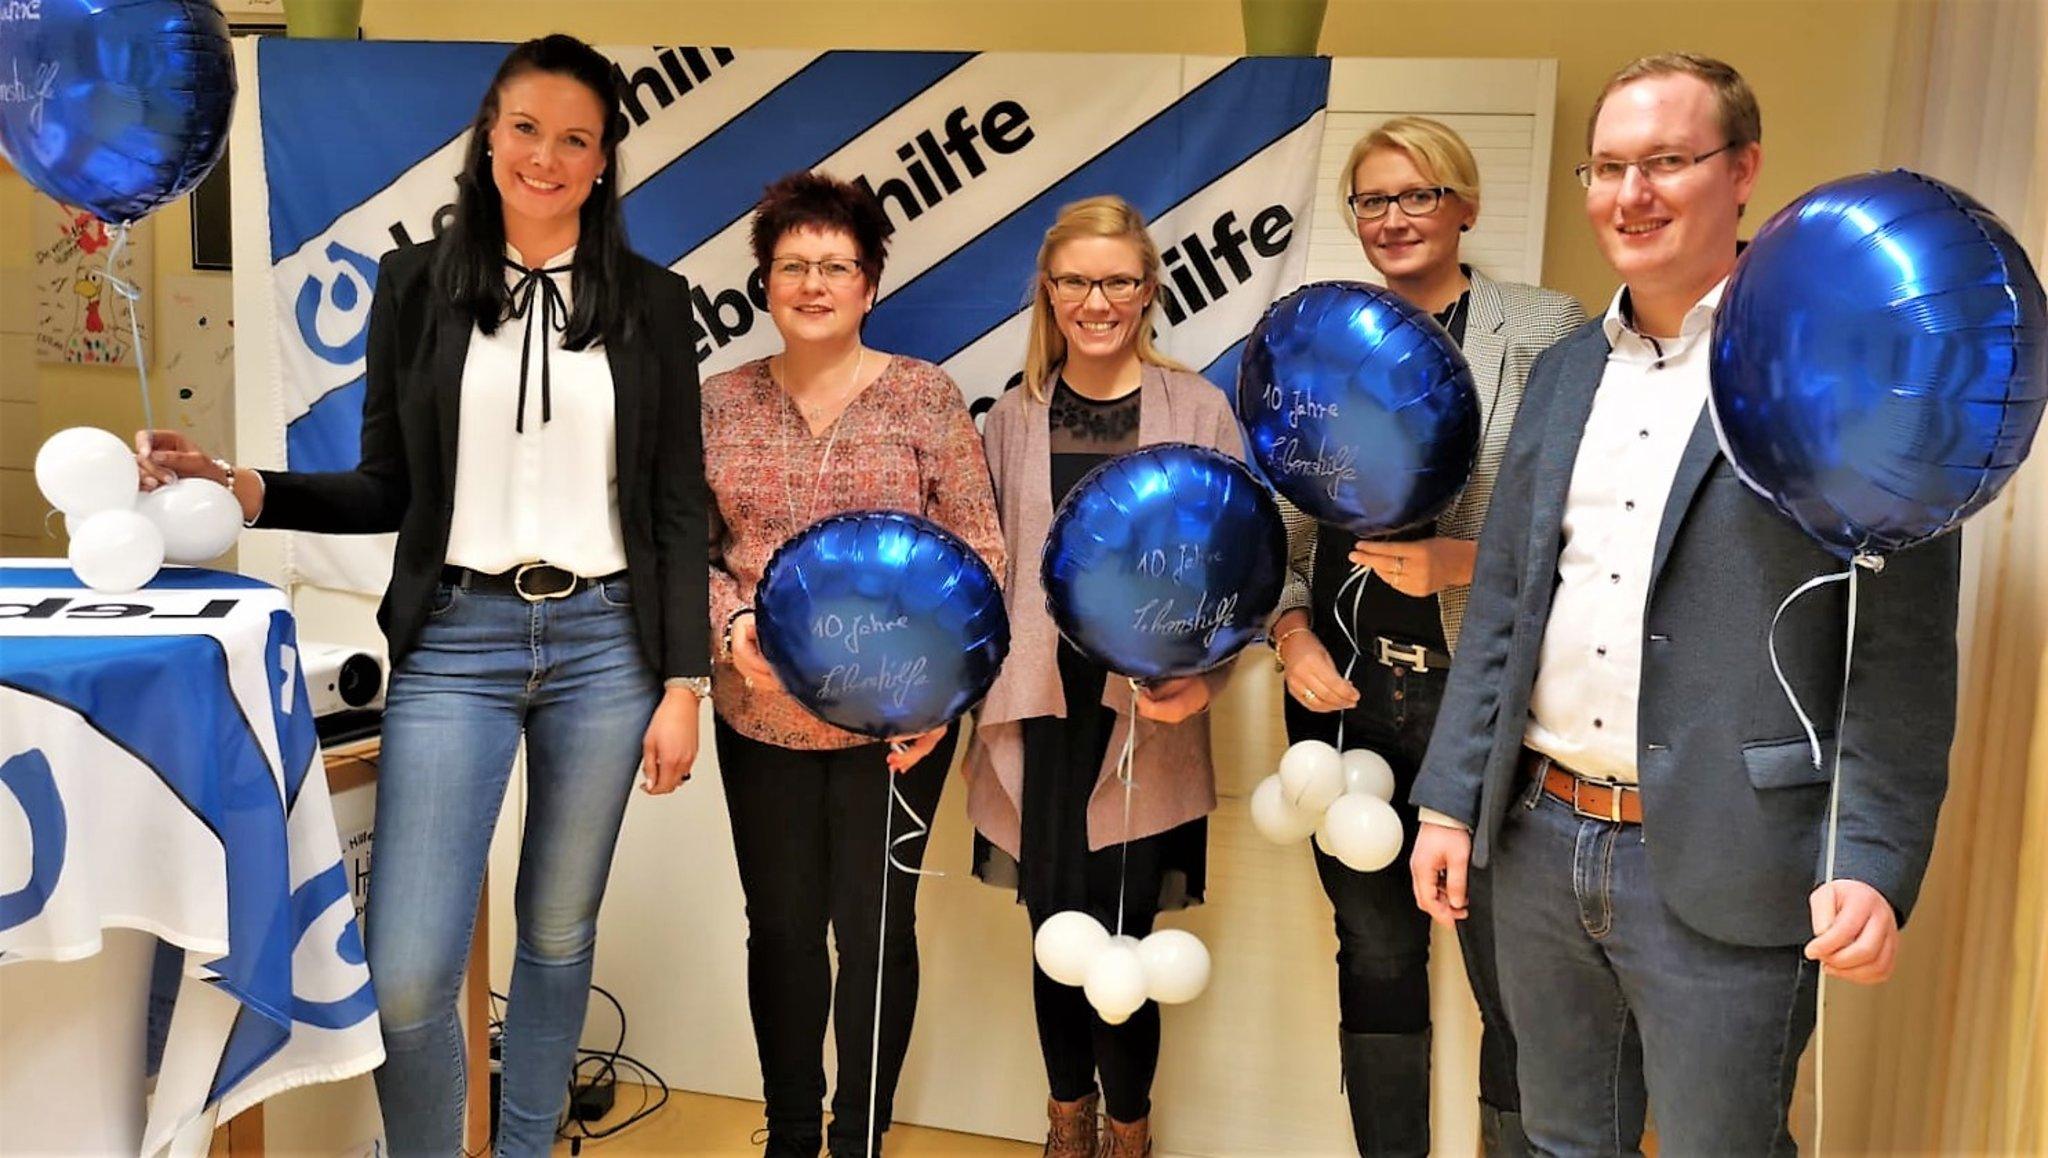 Gelebtes Miteinander: Lebenshilfe-Center feiert 10-jähriges Jubiläum - Lokalkompass.de